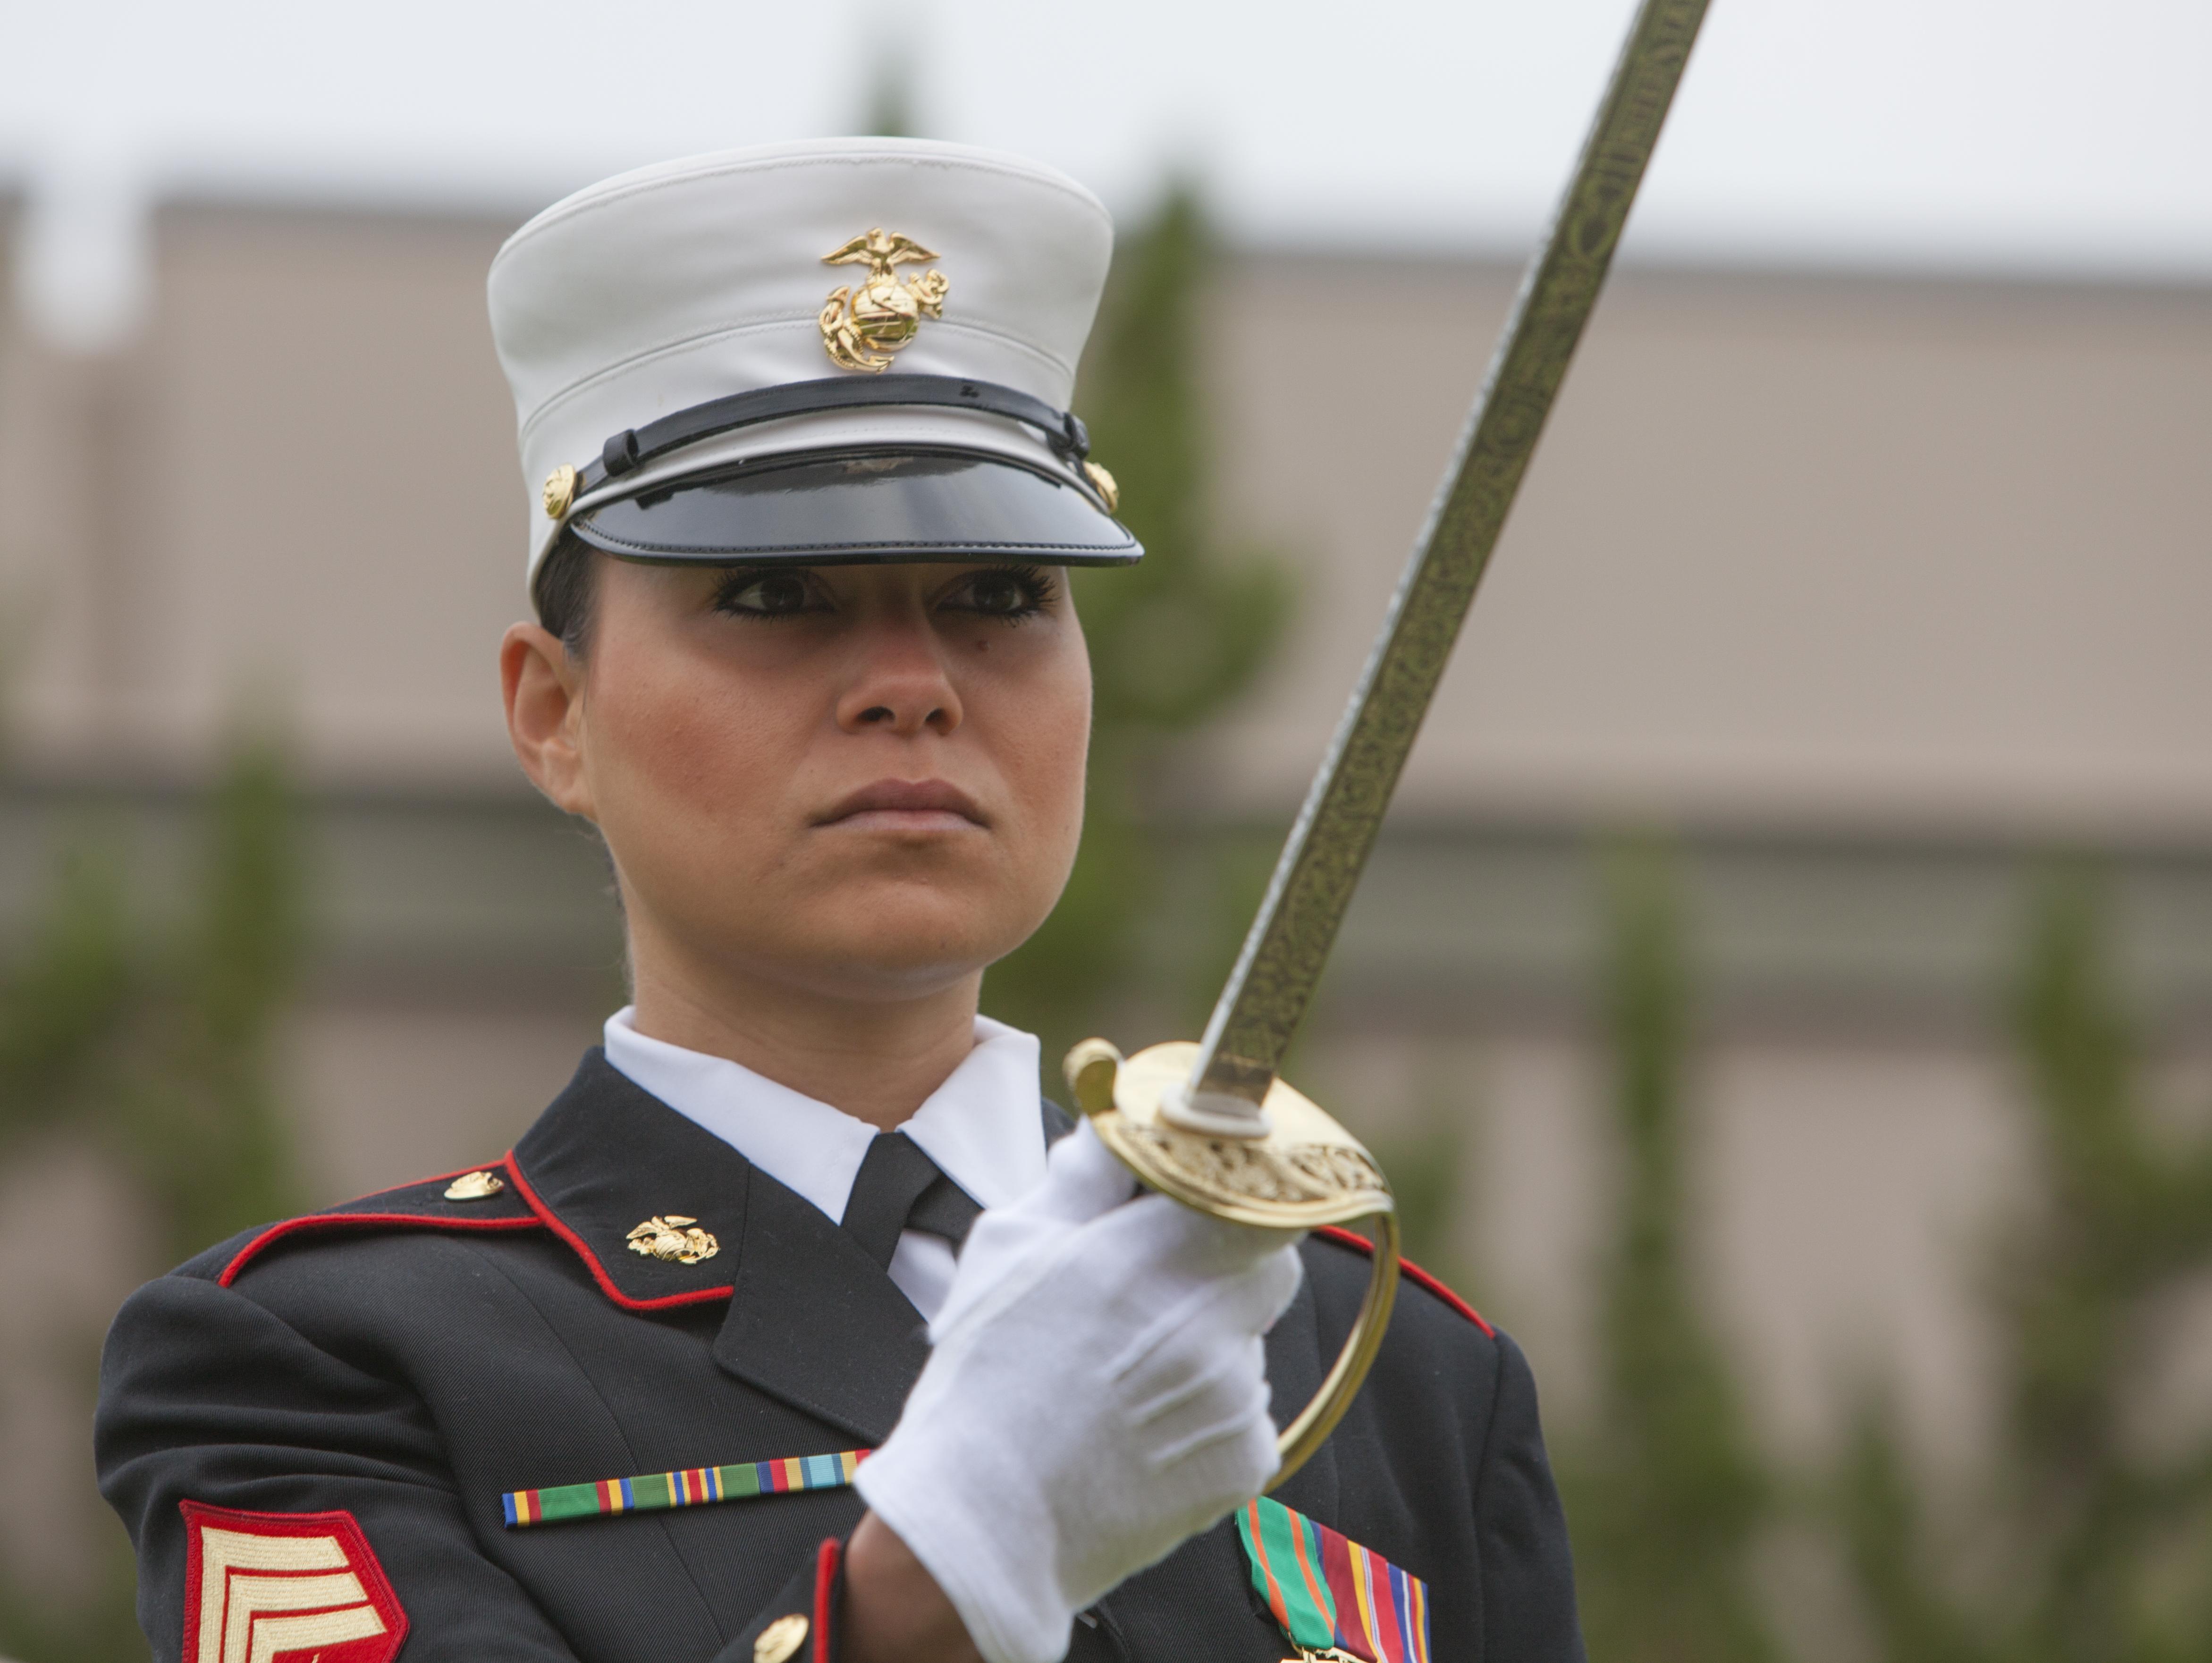 Pentagon: 6,000 New Military Jobs for Women - USNI News